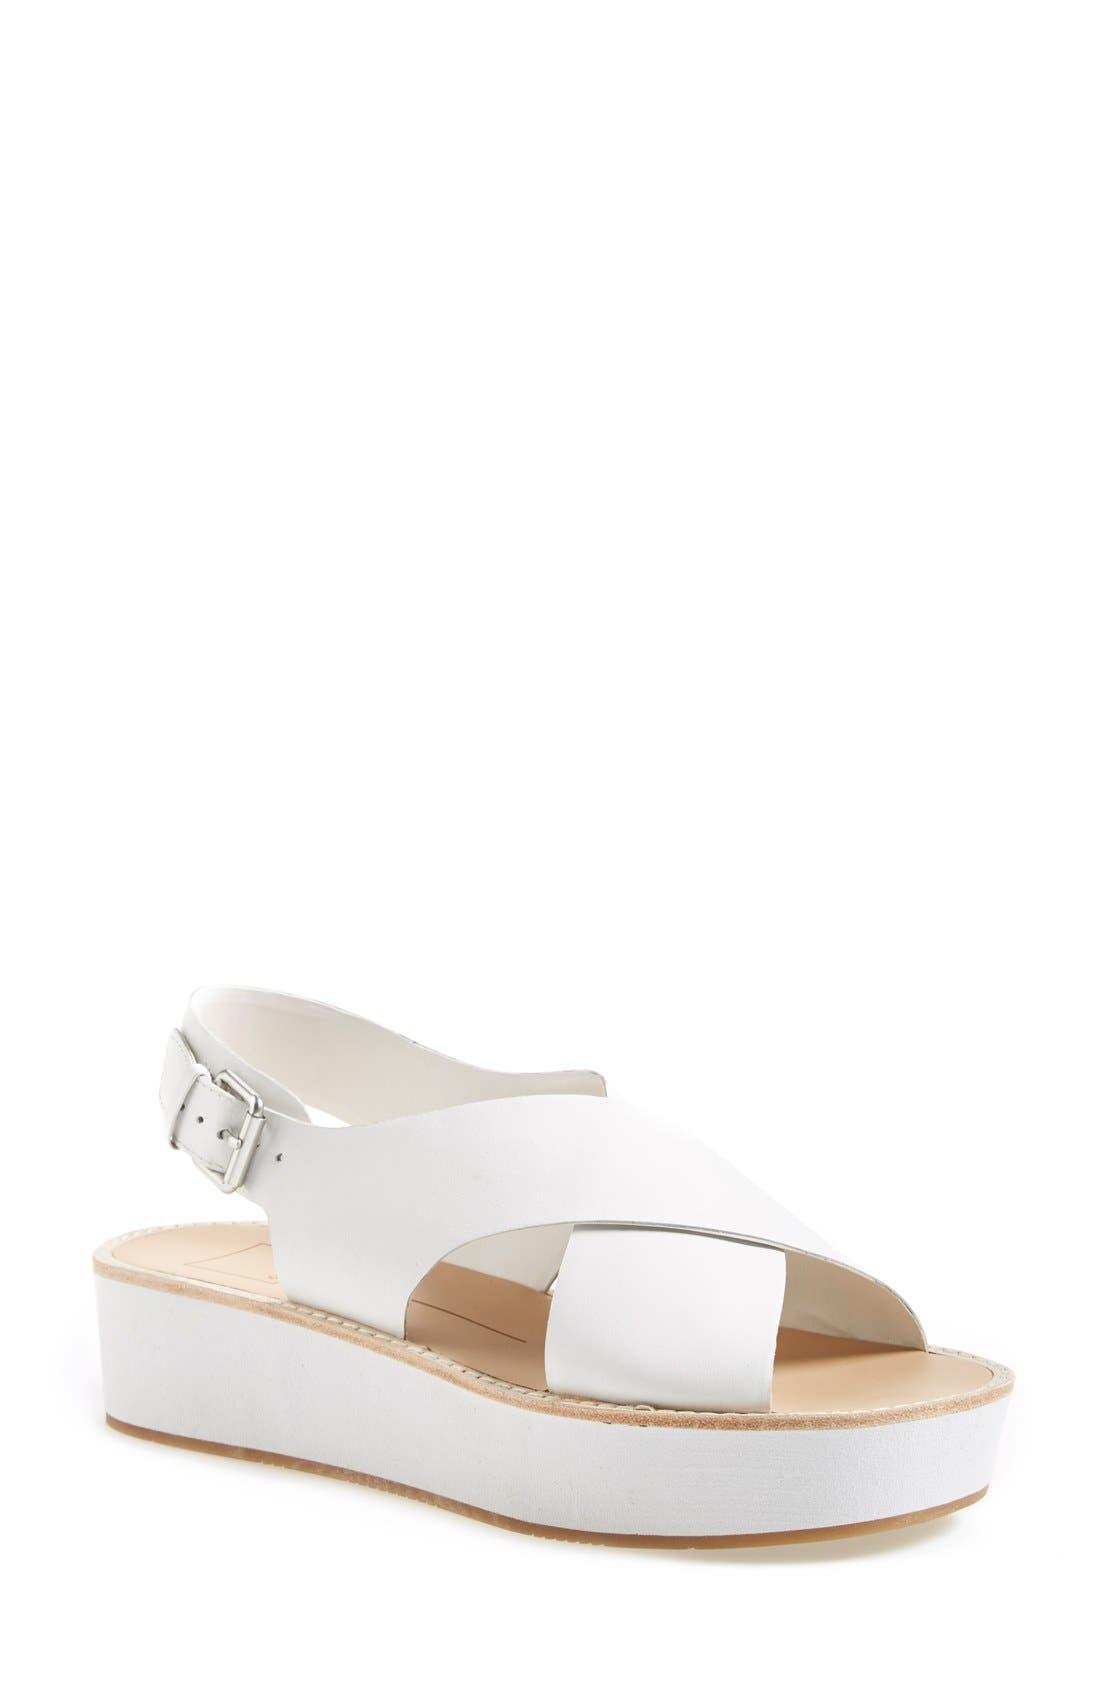 Main Image - Dolce Vita 'Ziggie' Sandal (Women)